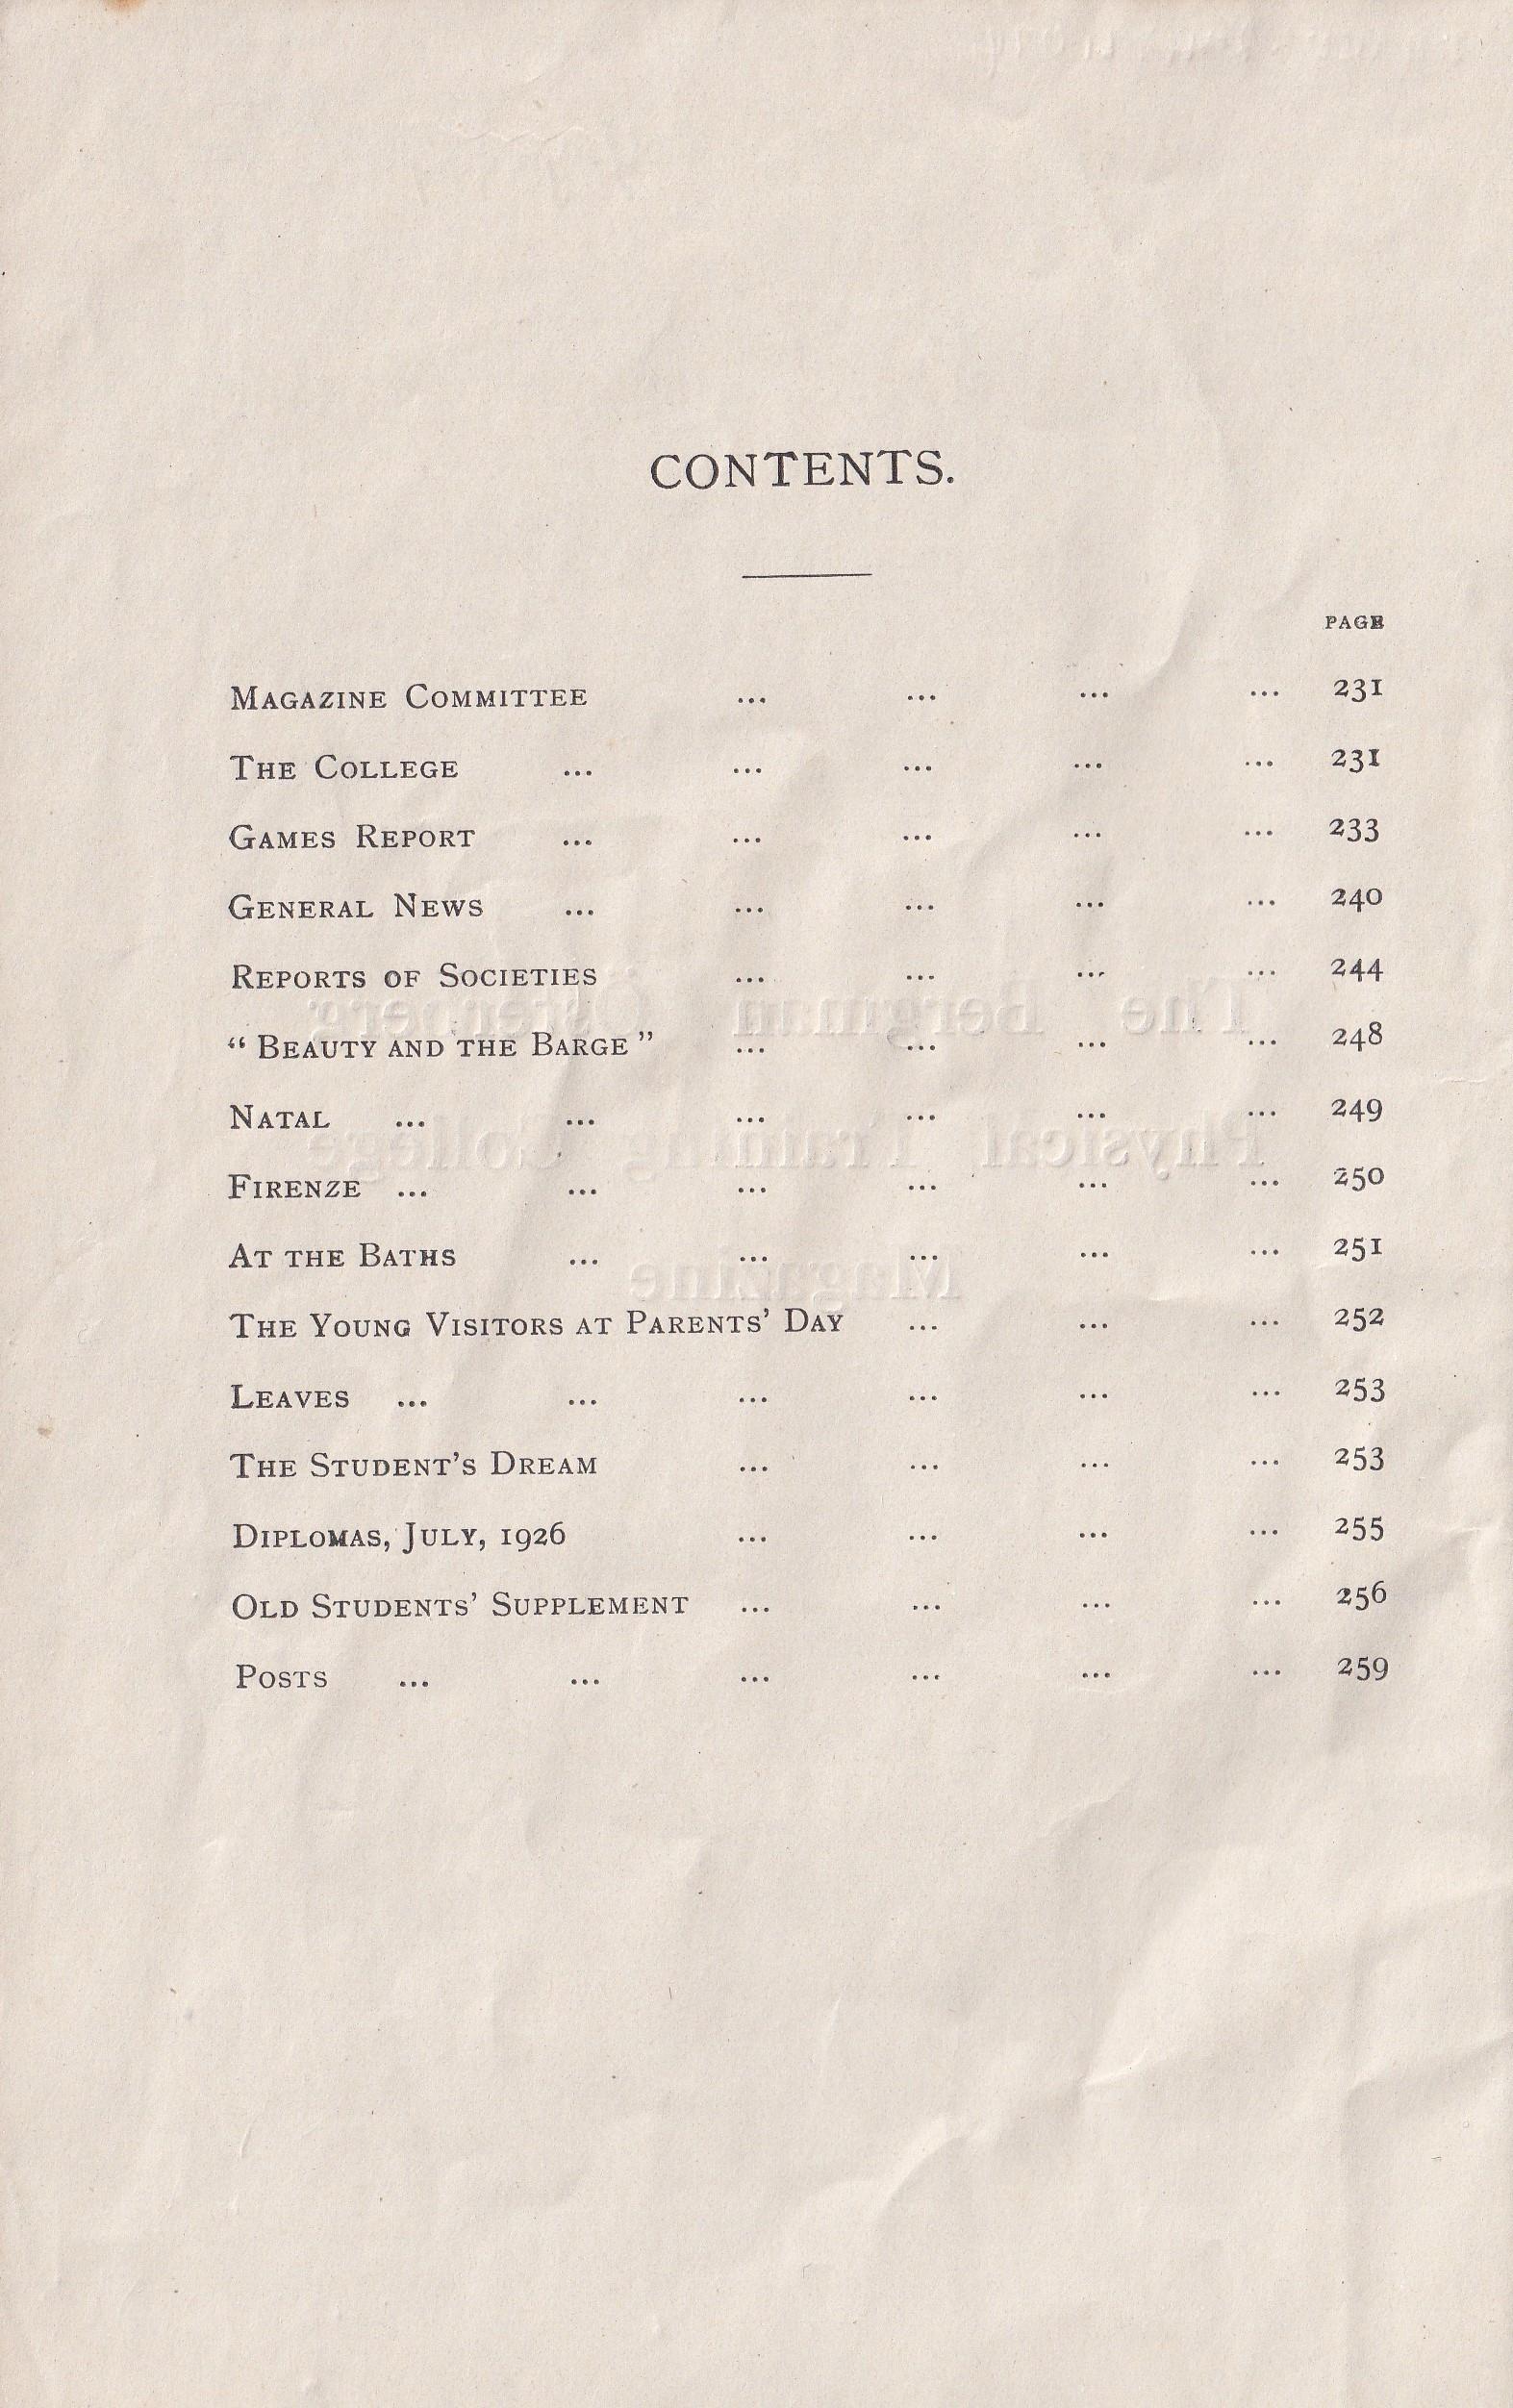 BOPTC 1926 Contents